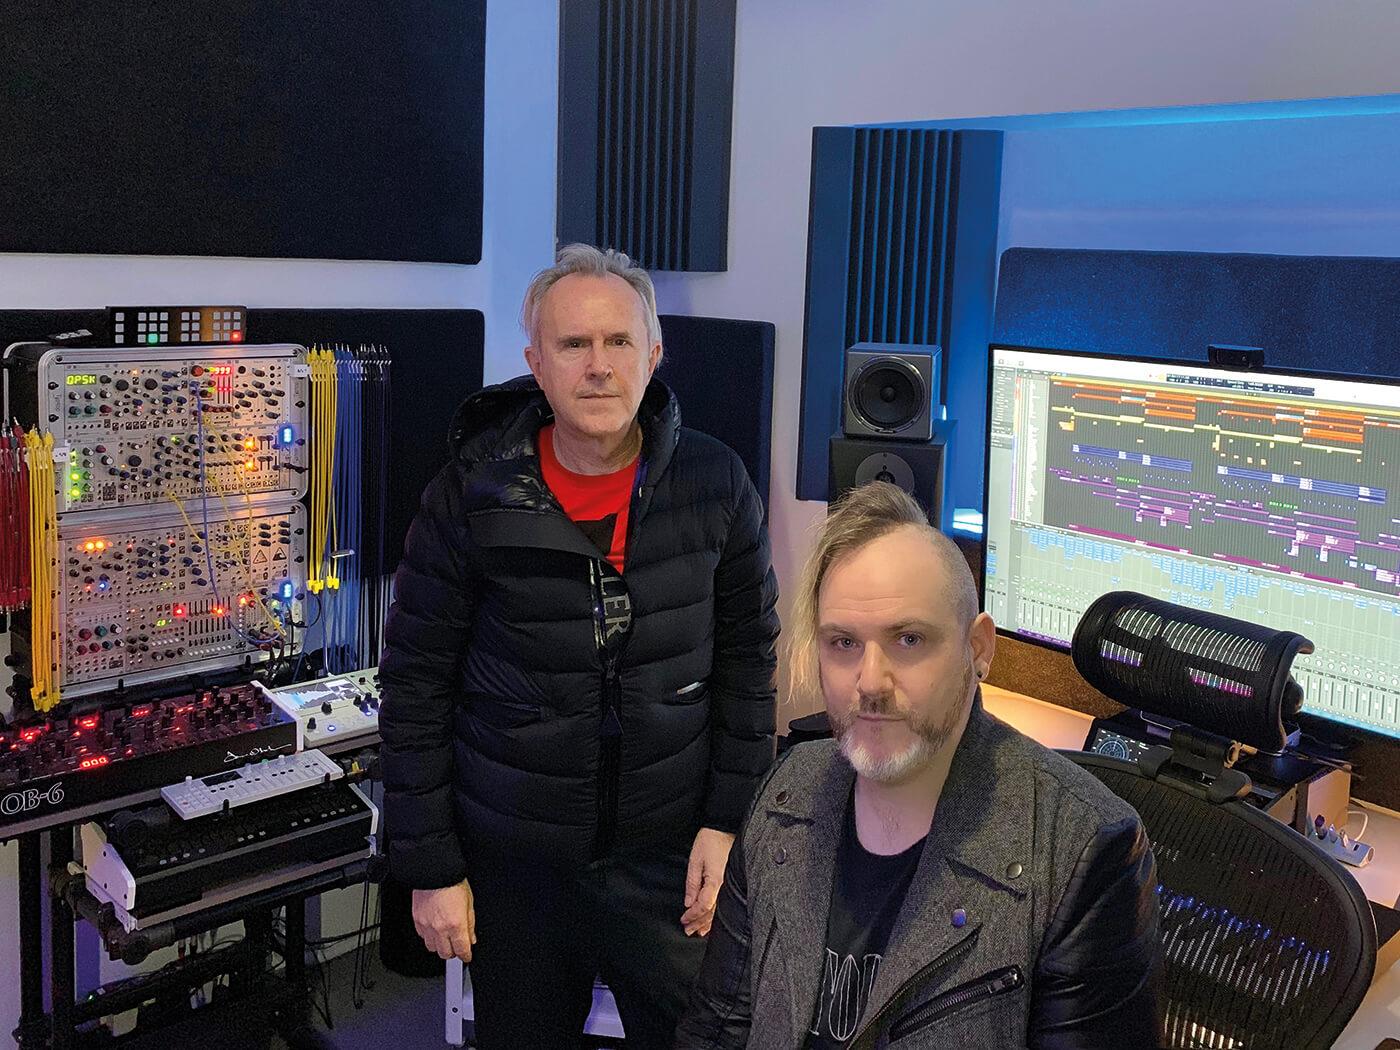 HOJO and Robbie Bronnimann